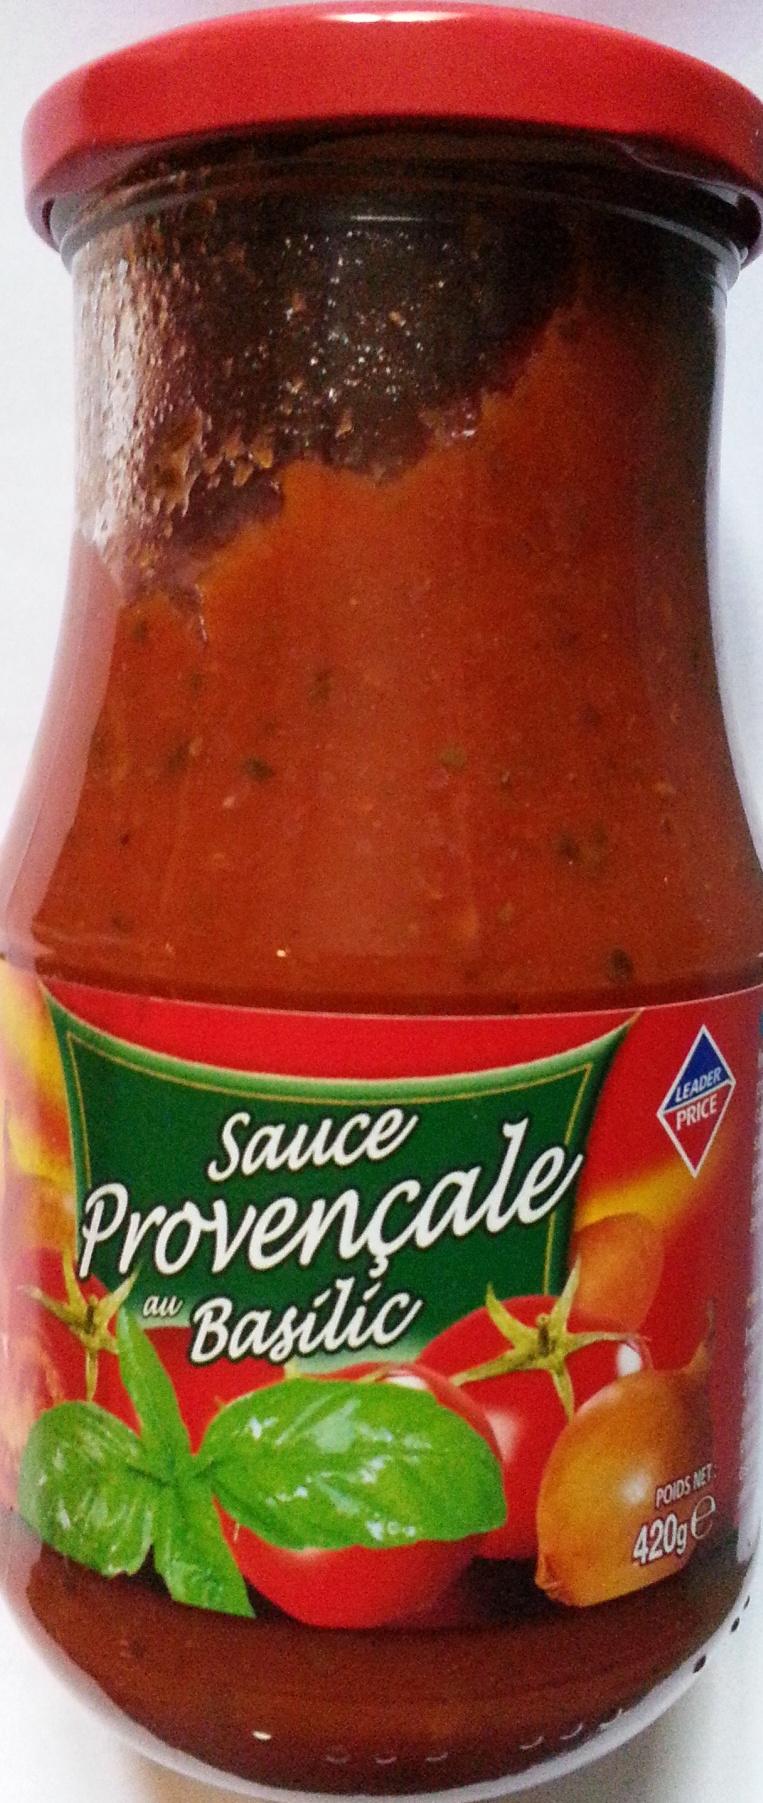 Sauce Provençale au Basilic - Produit